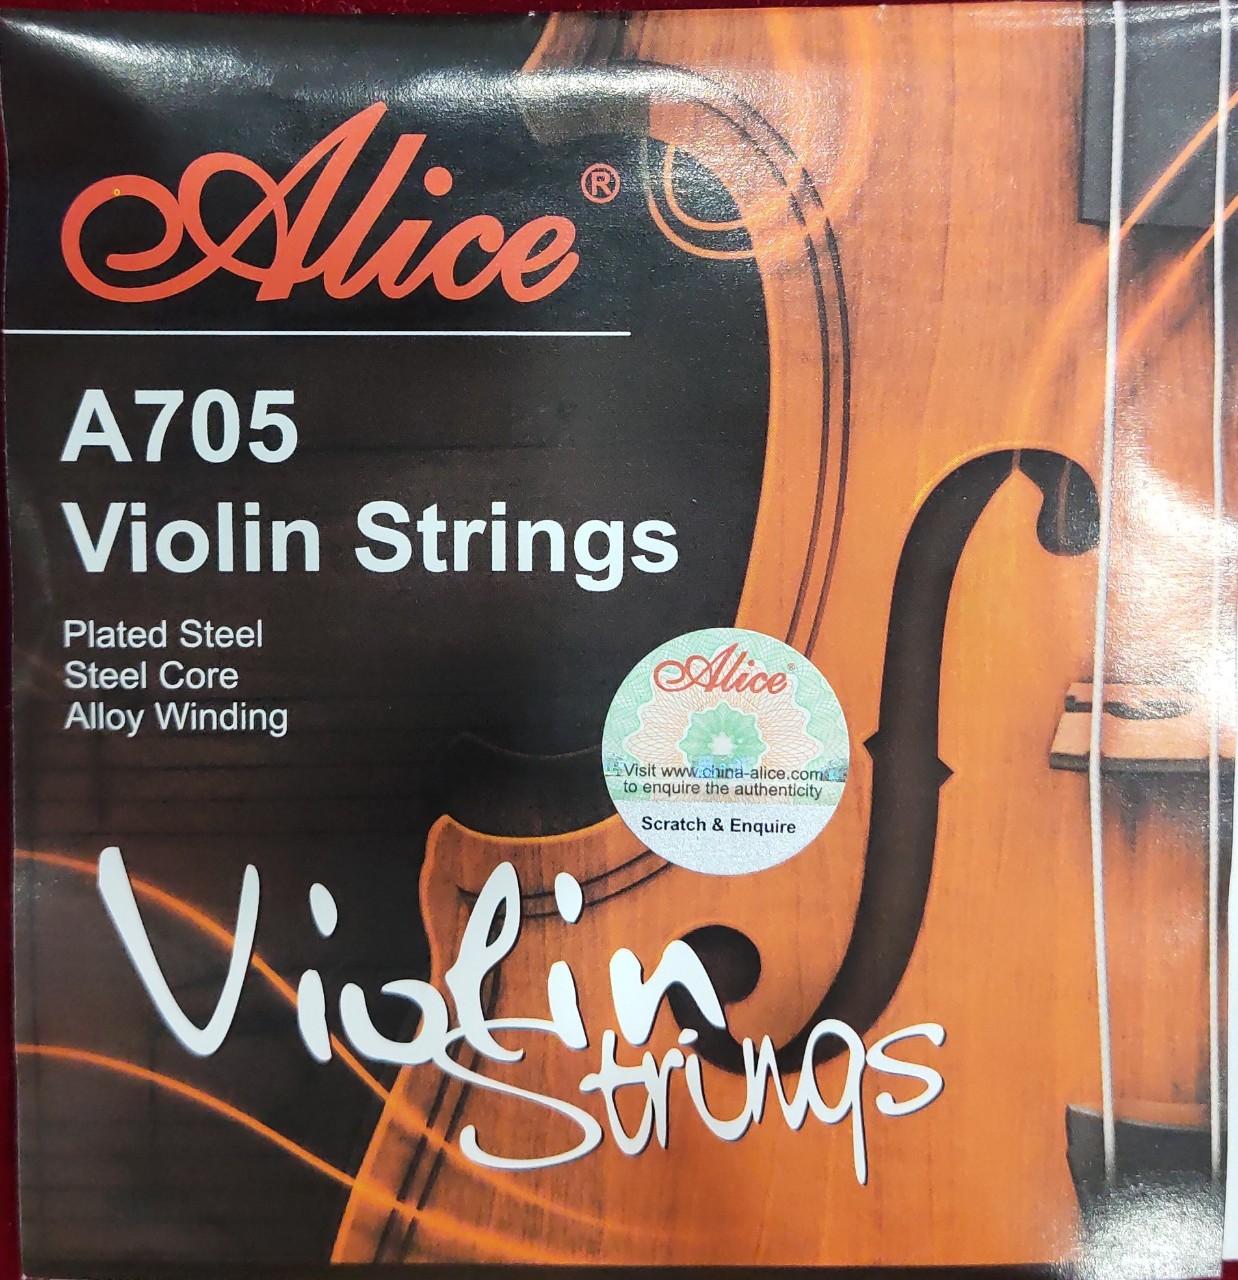 Dây Violin Alice A705 Plated Steel, Steel Core, Alloy Winding